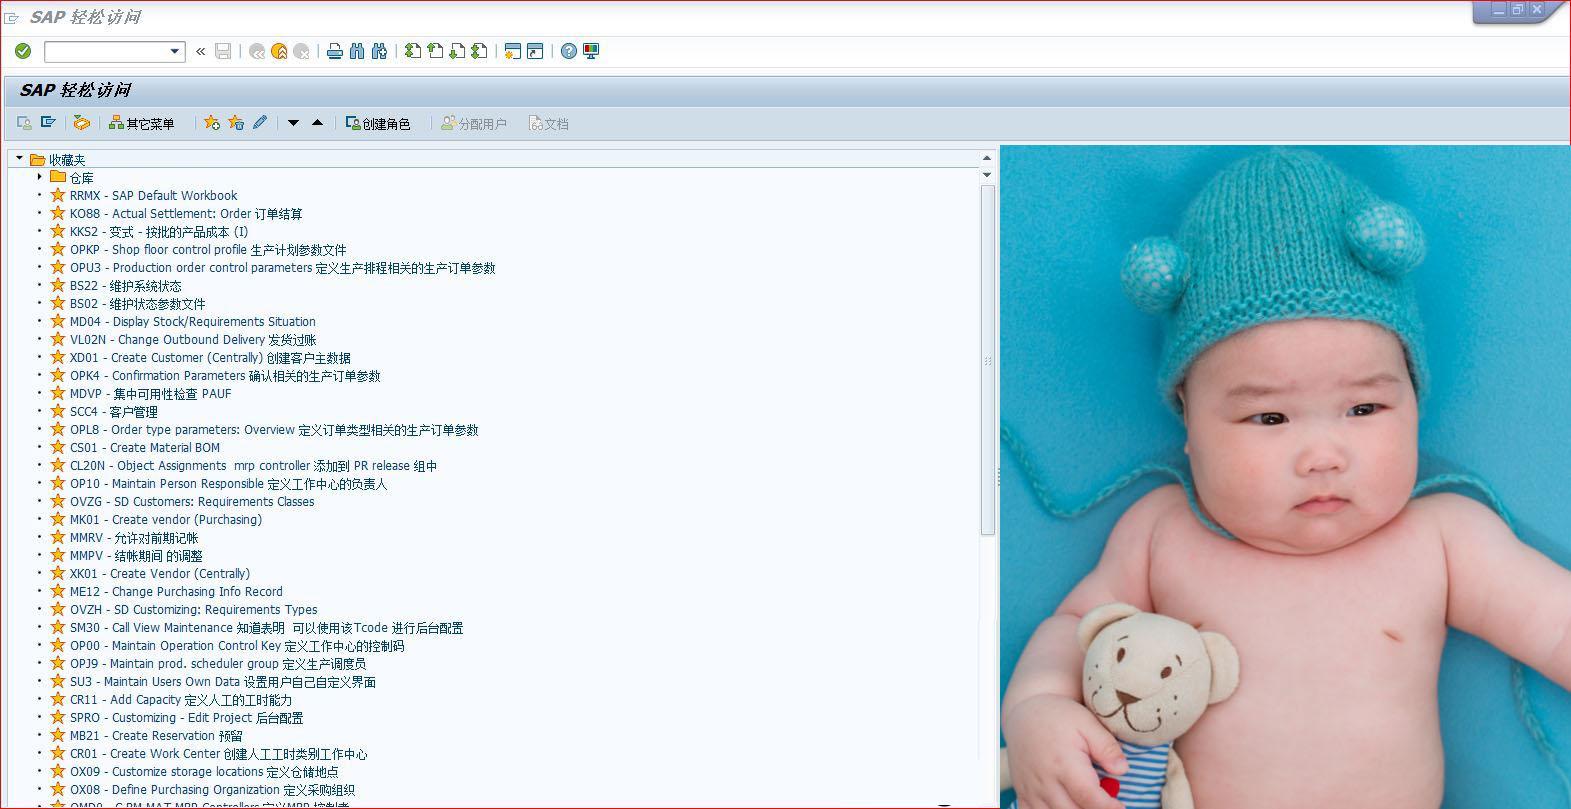 SAP修改登录桌面背景图片 图1